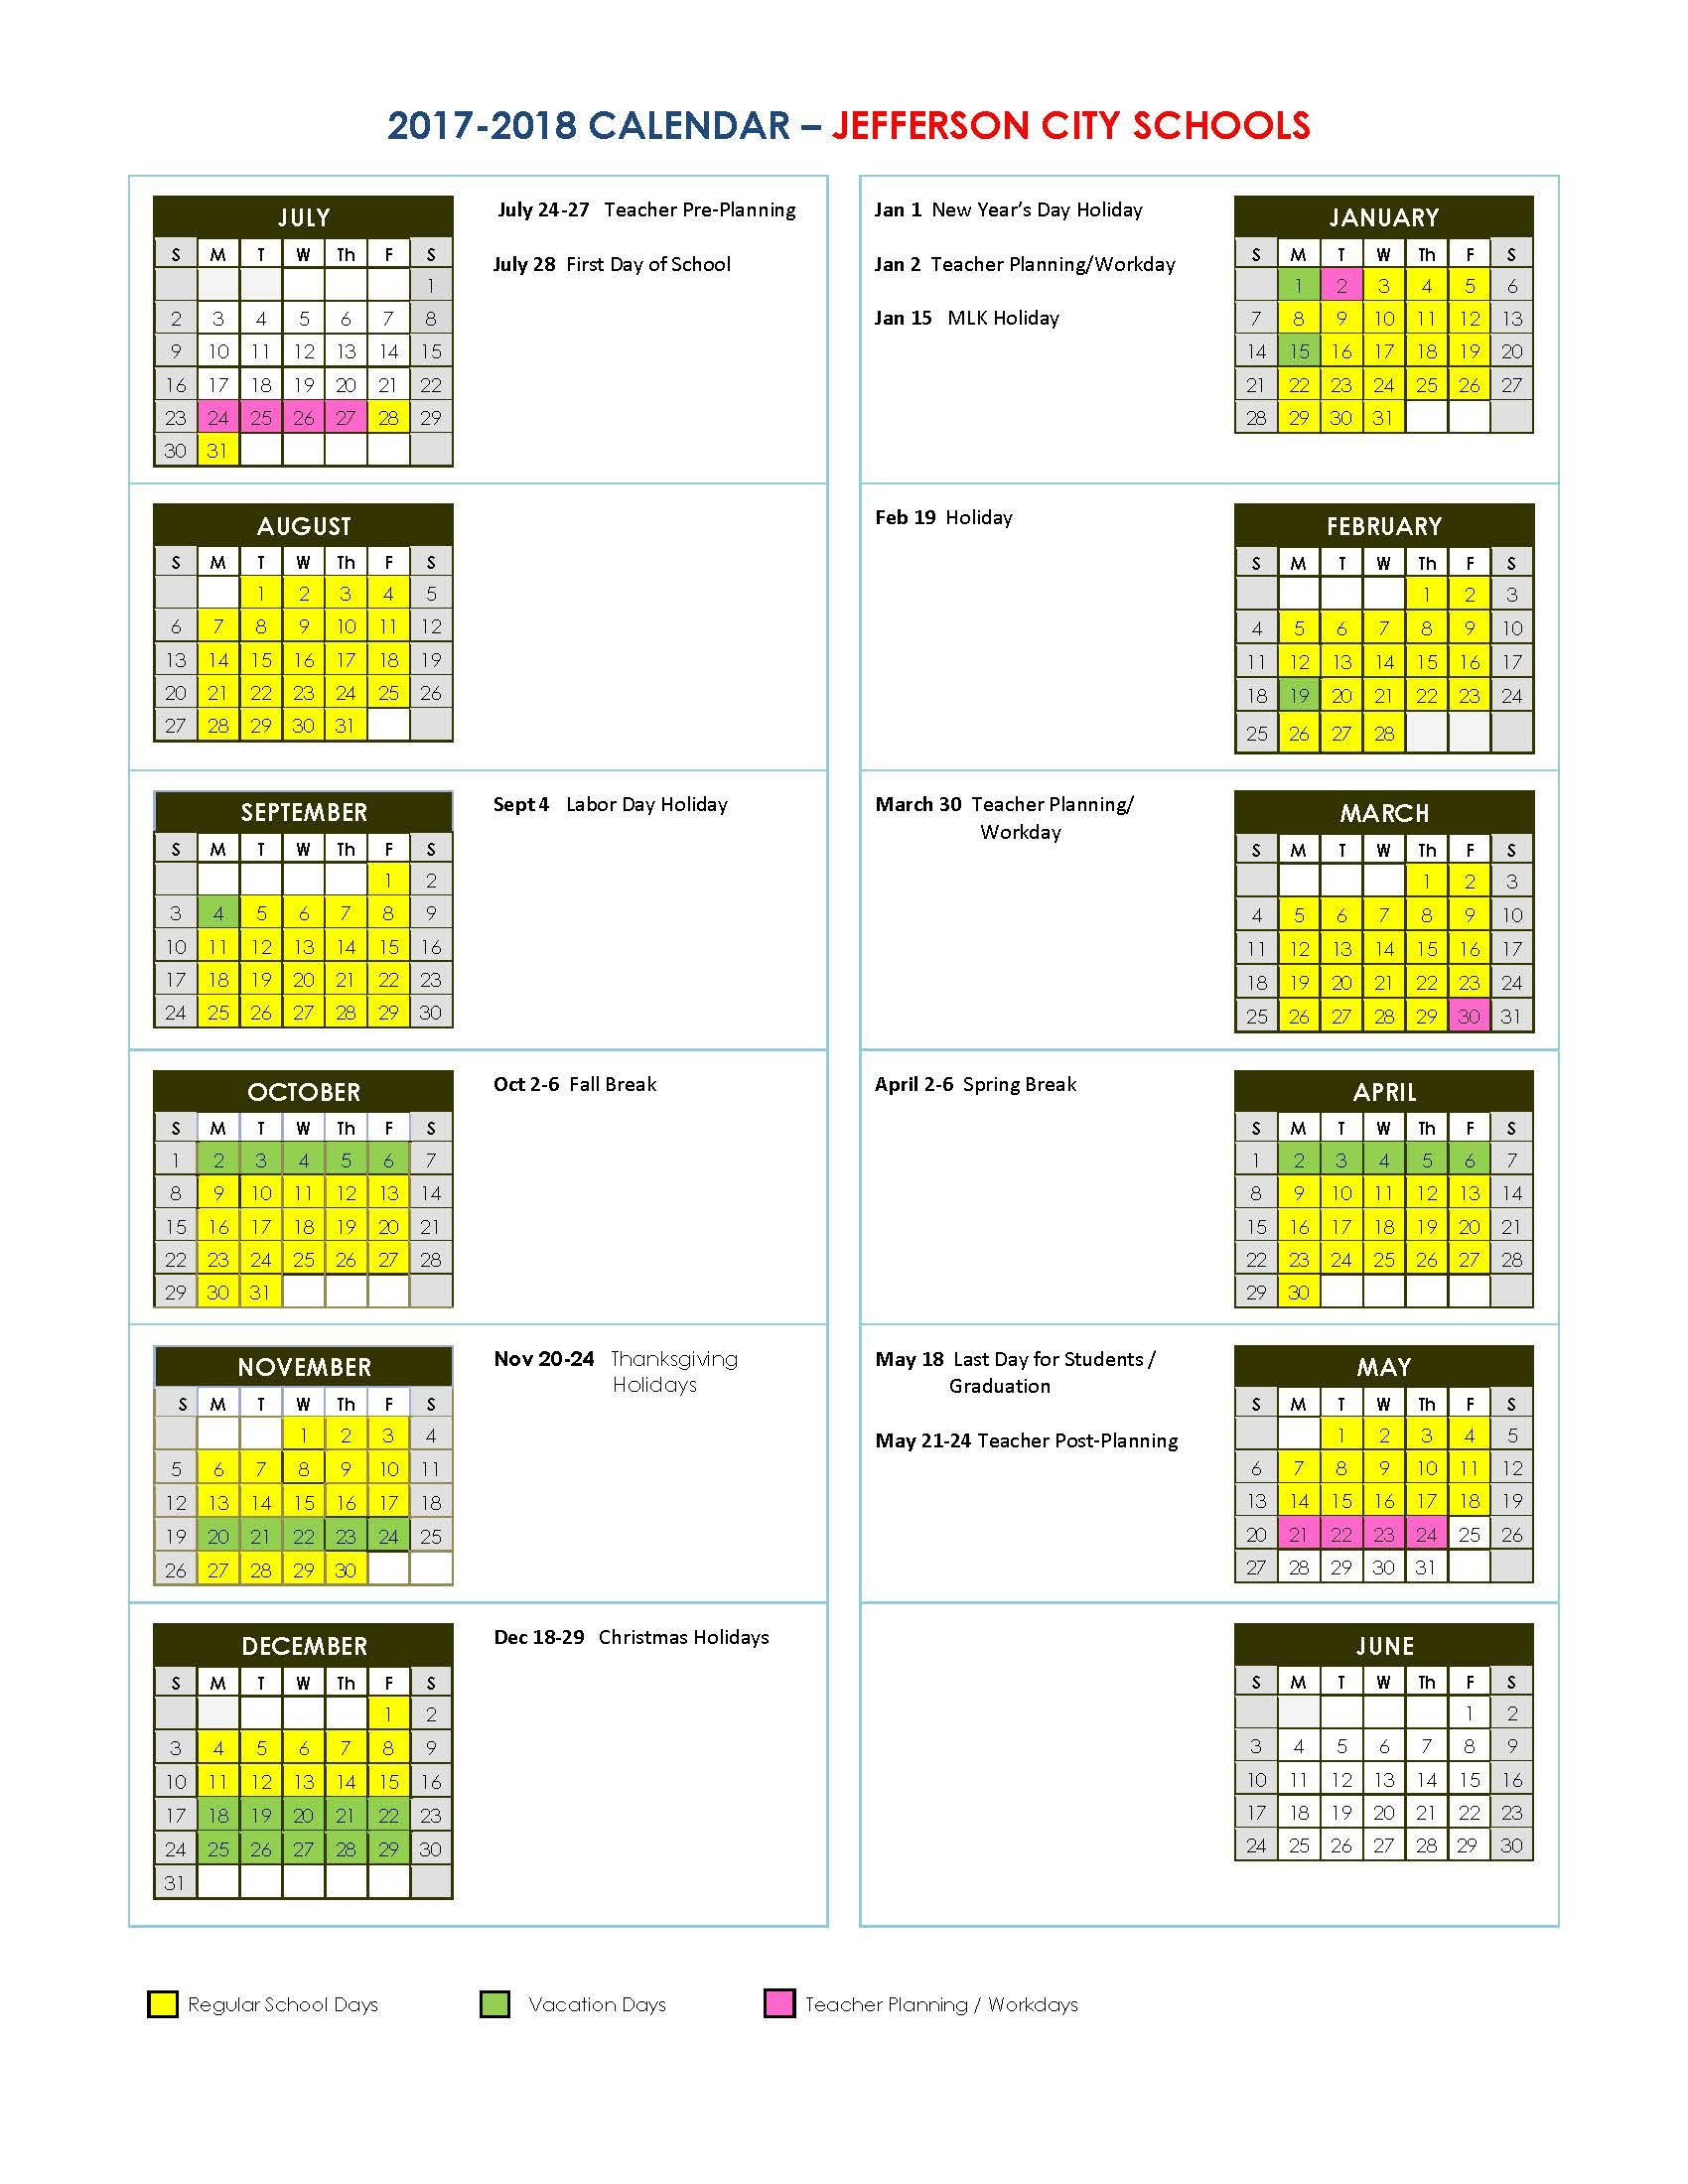 Ga State University Calendar 2021 | Printable Calendar For Georgia State University Calendar 2020